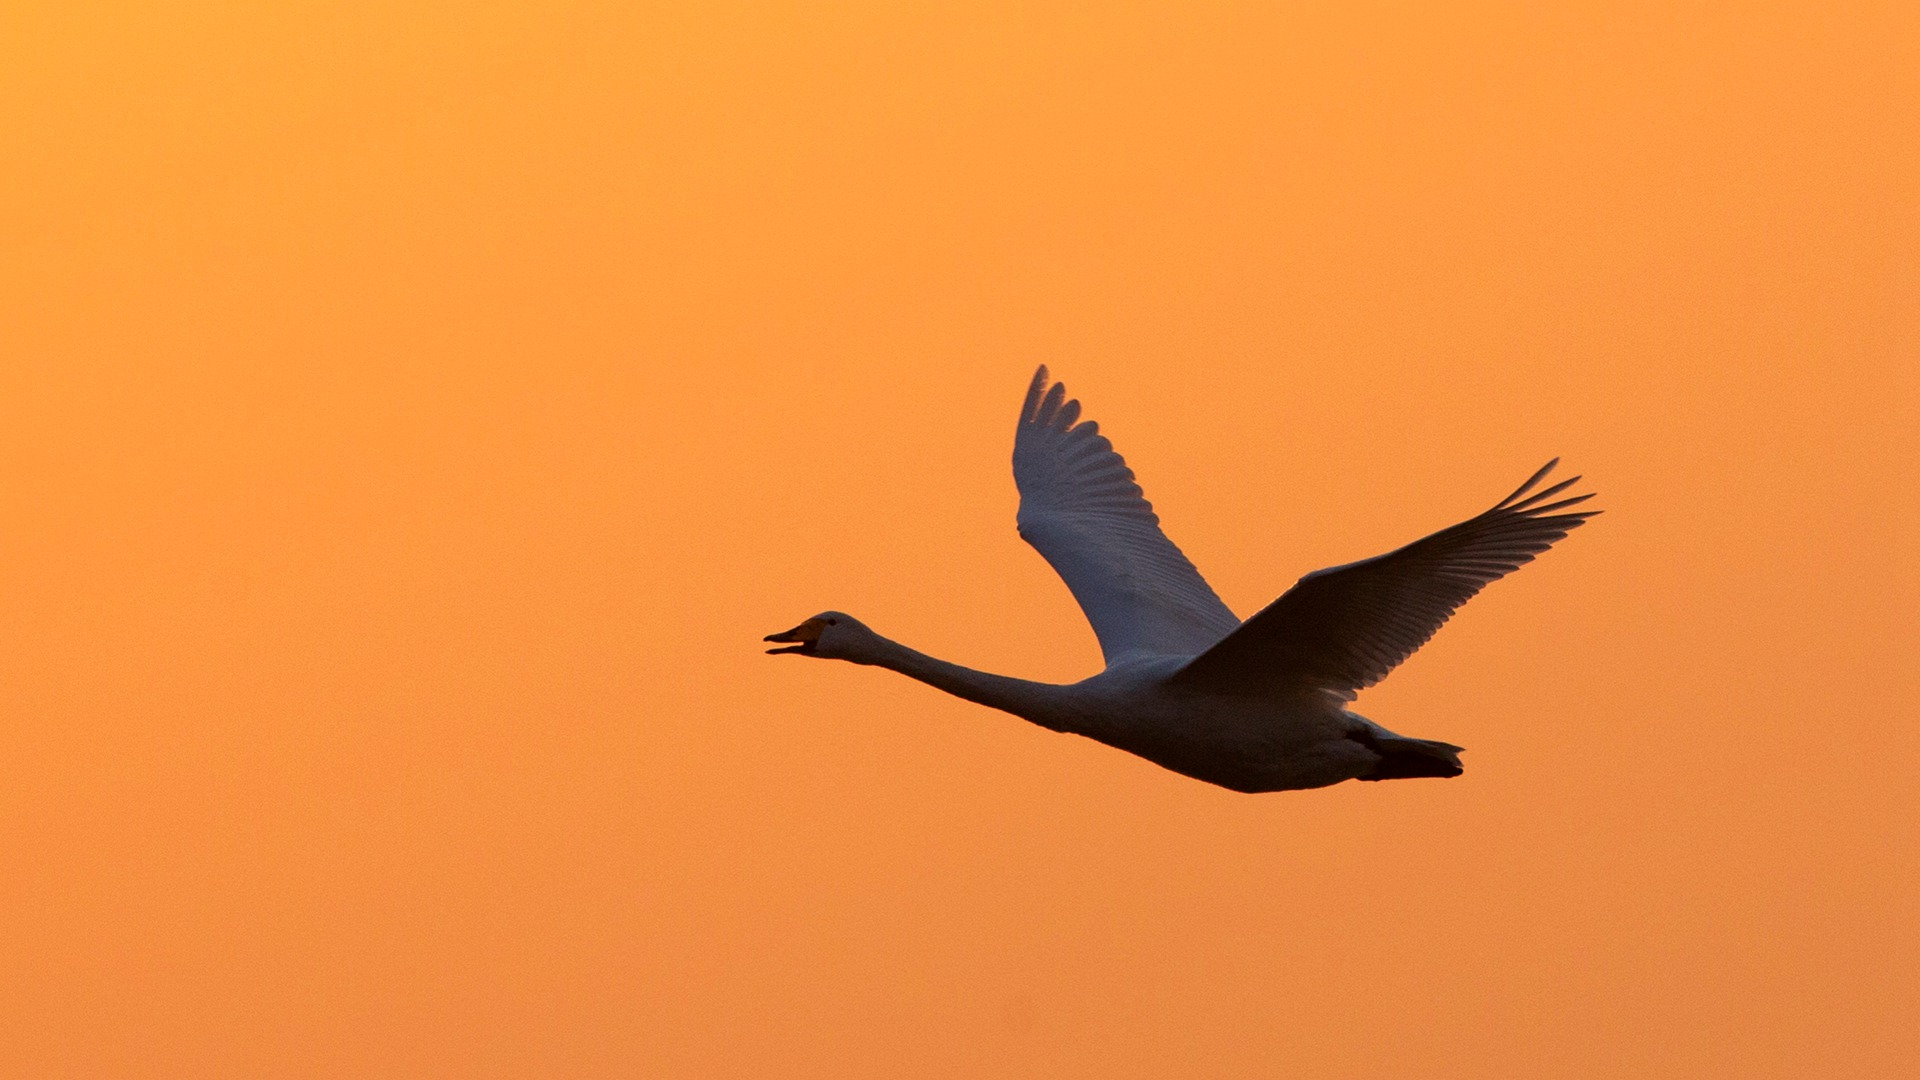 spoo作品:晨曦里的天鹅湖.....